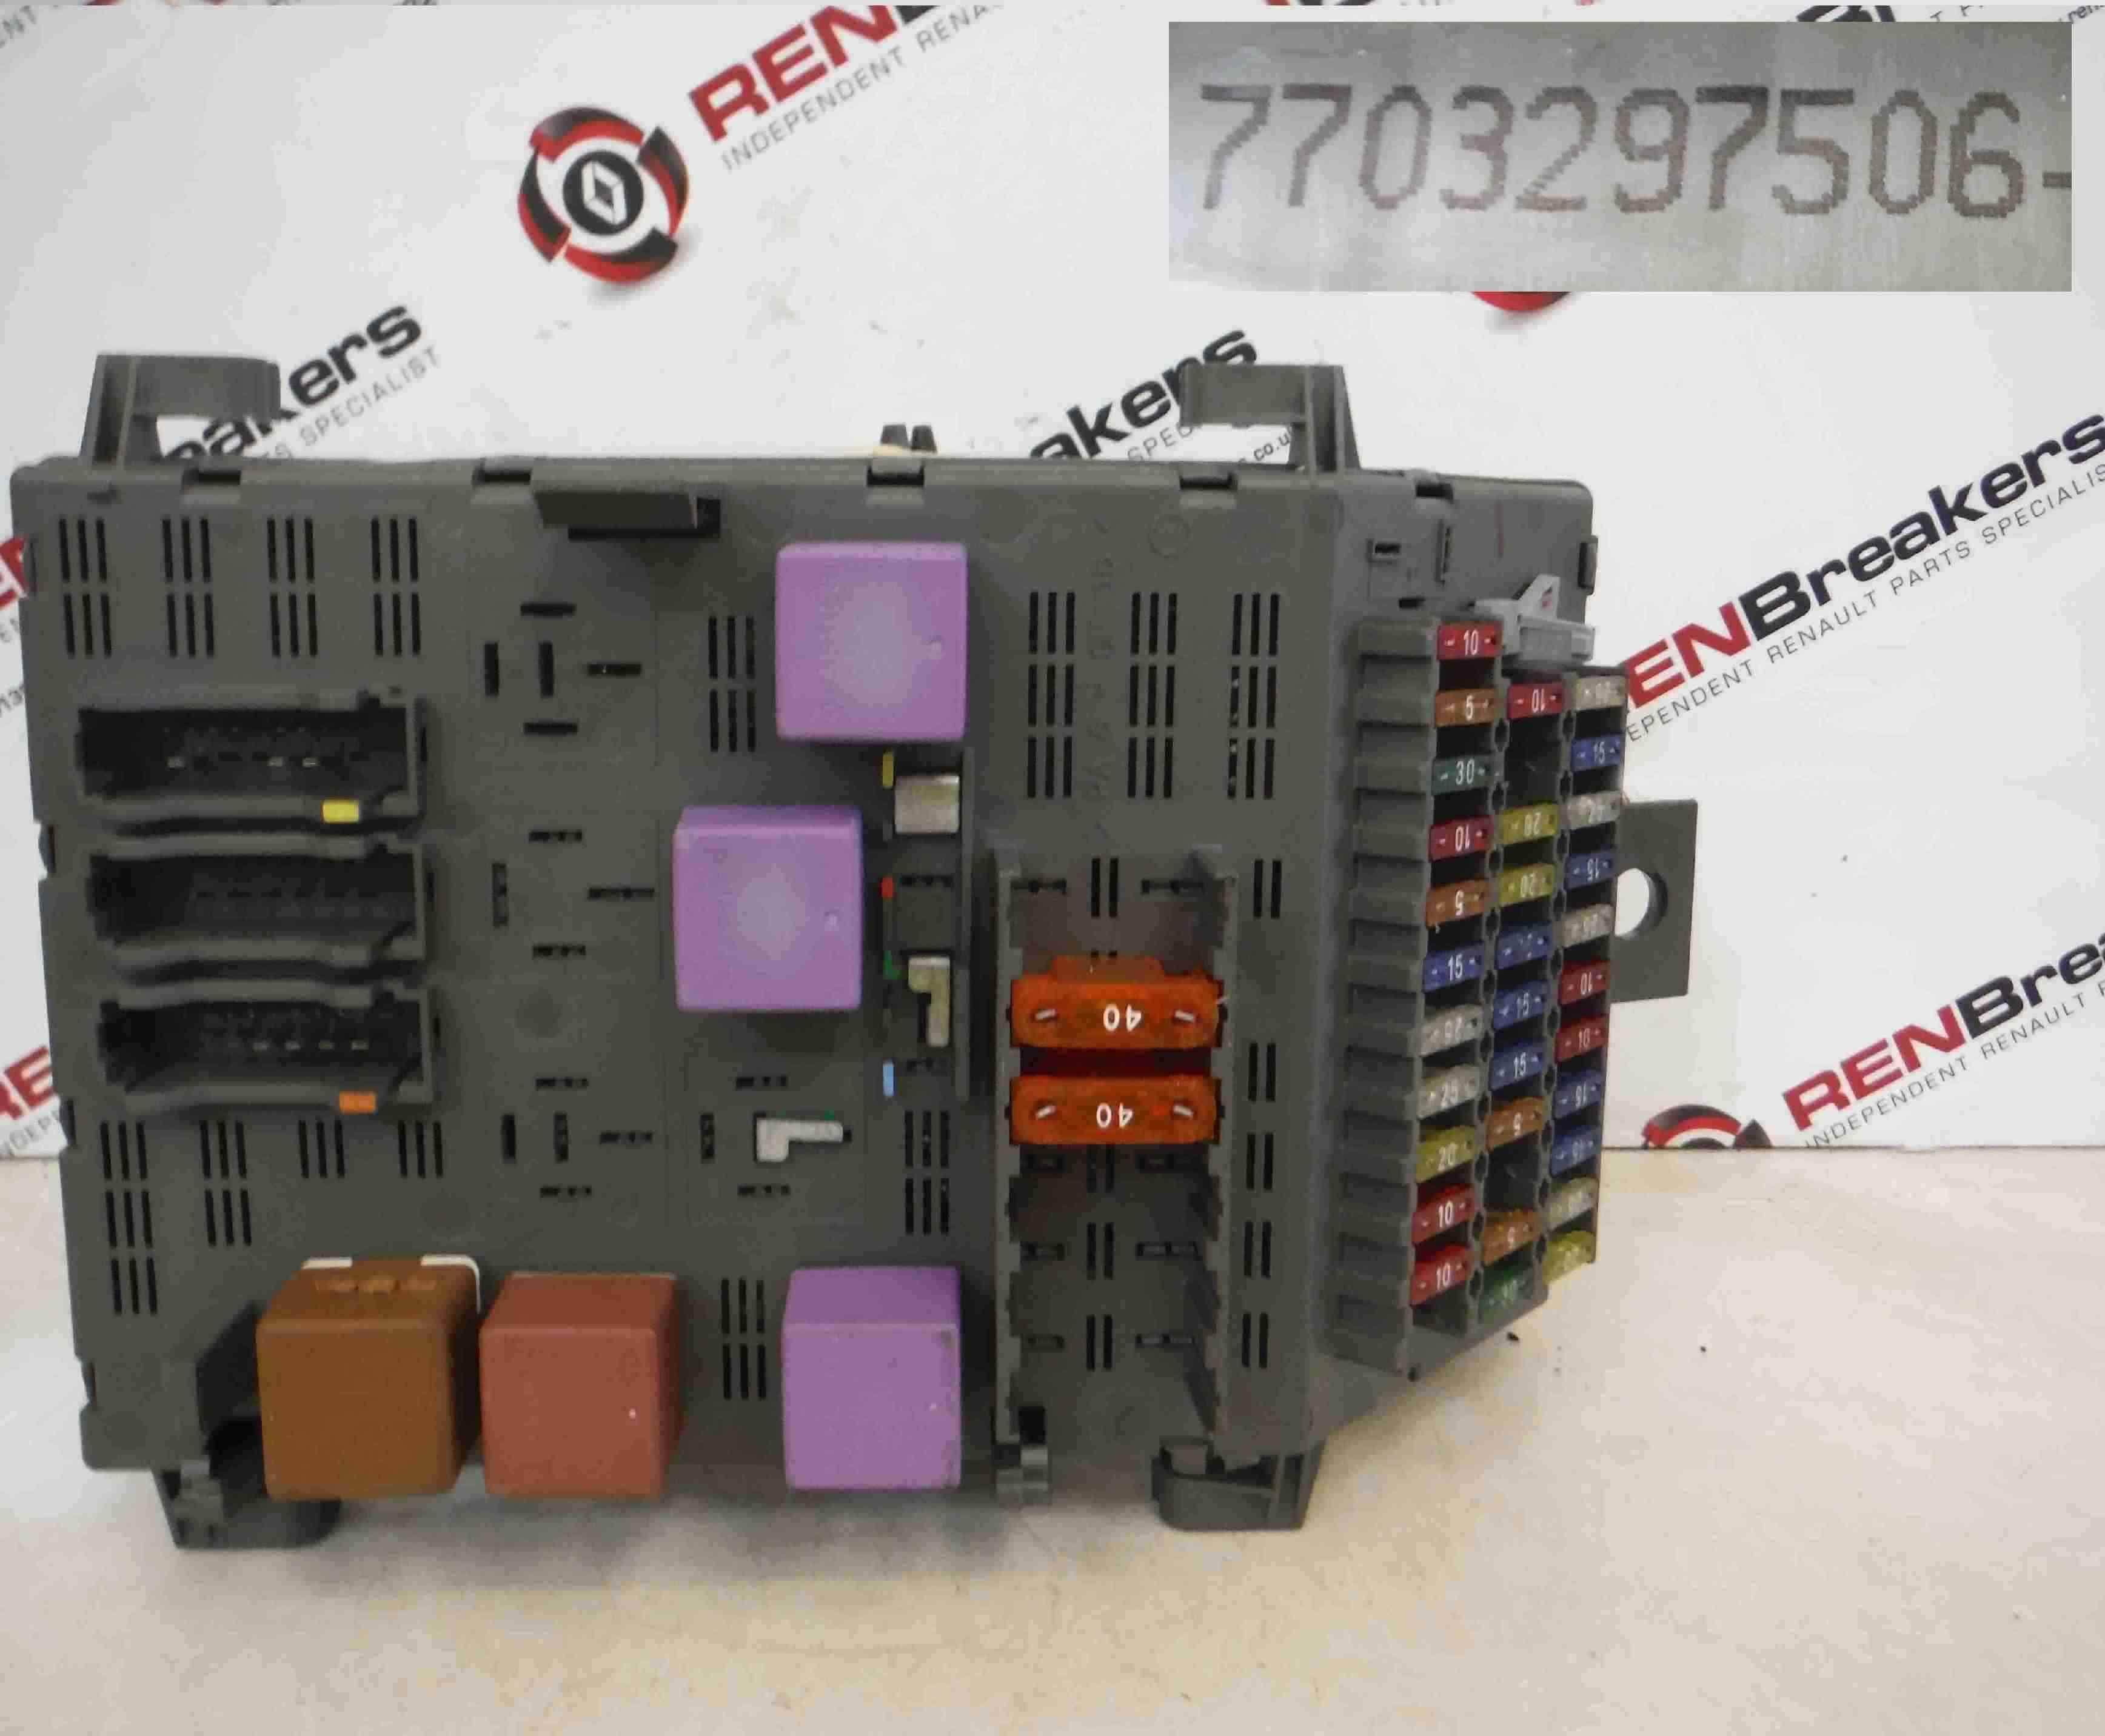 Fuse Box On Renault Laguna Wiring Diagrams Megane Ebay 1993 1999 Engine Diagram 2017